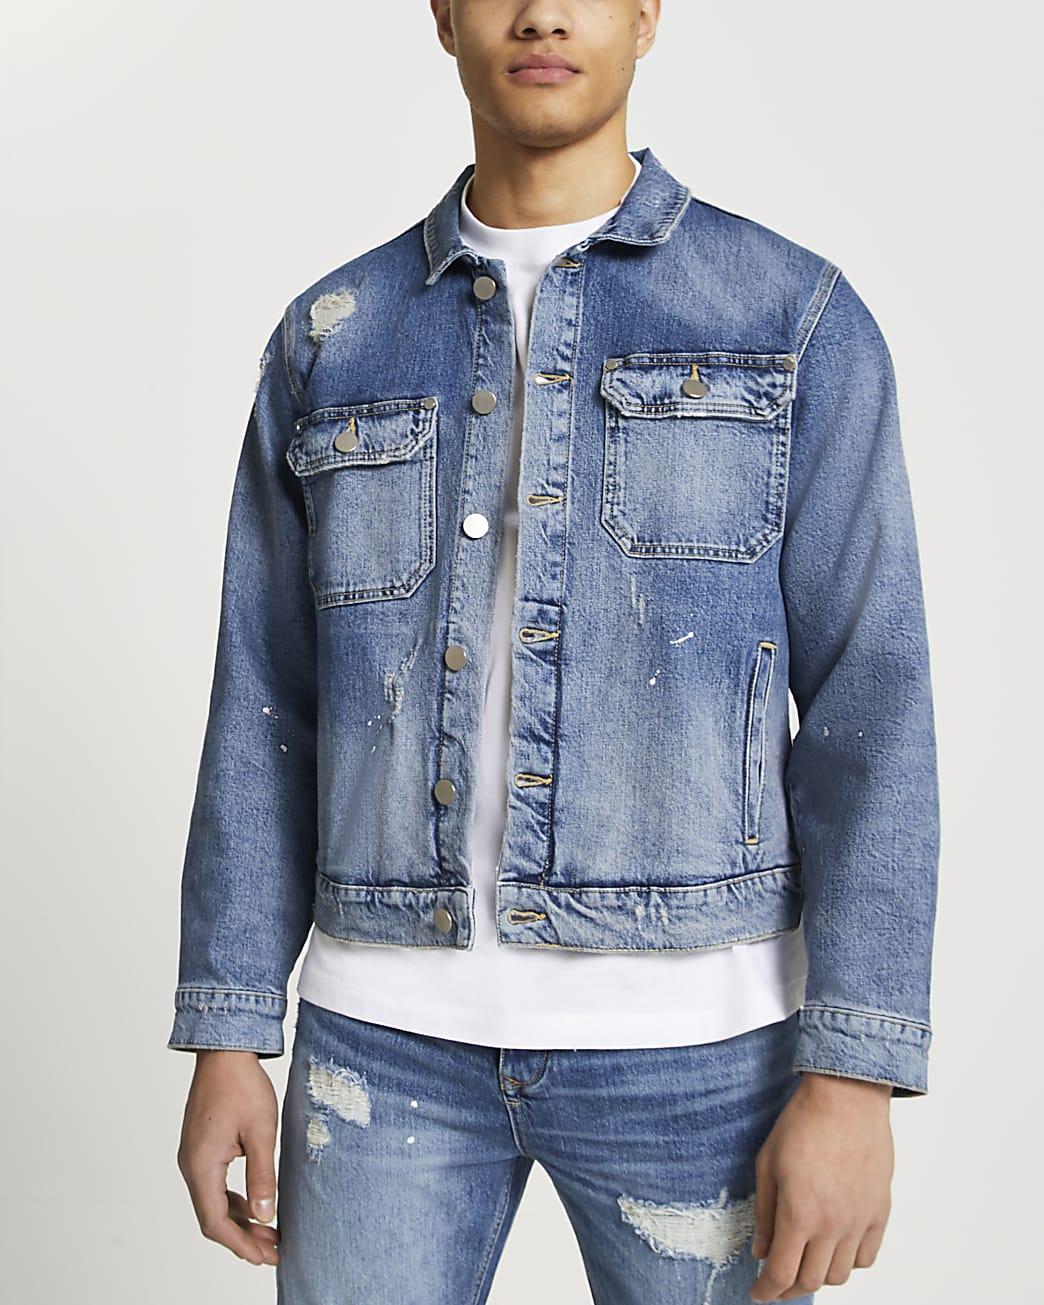 Blue denim jacket